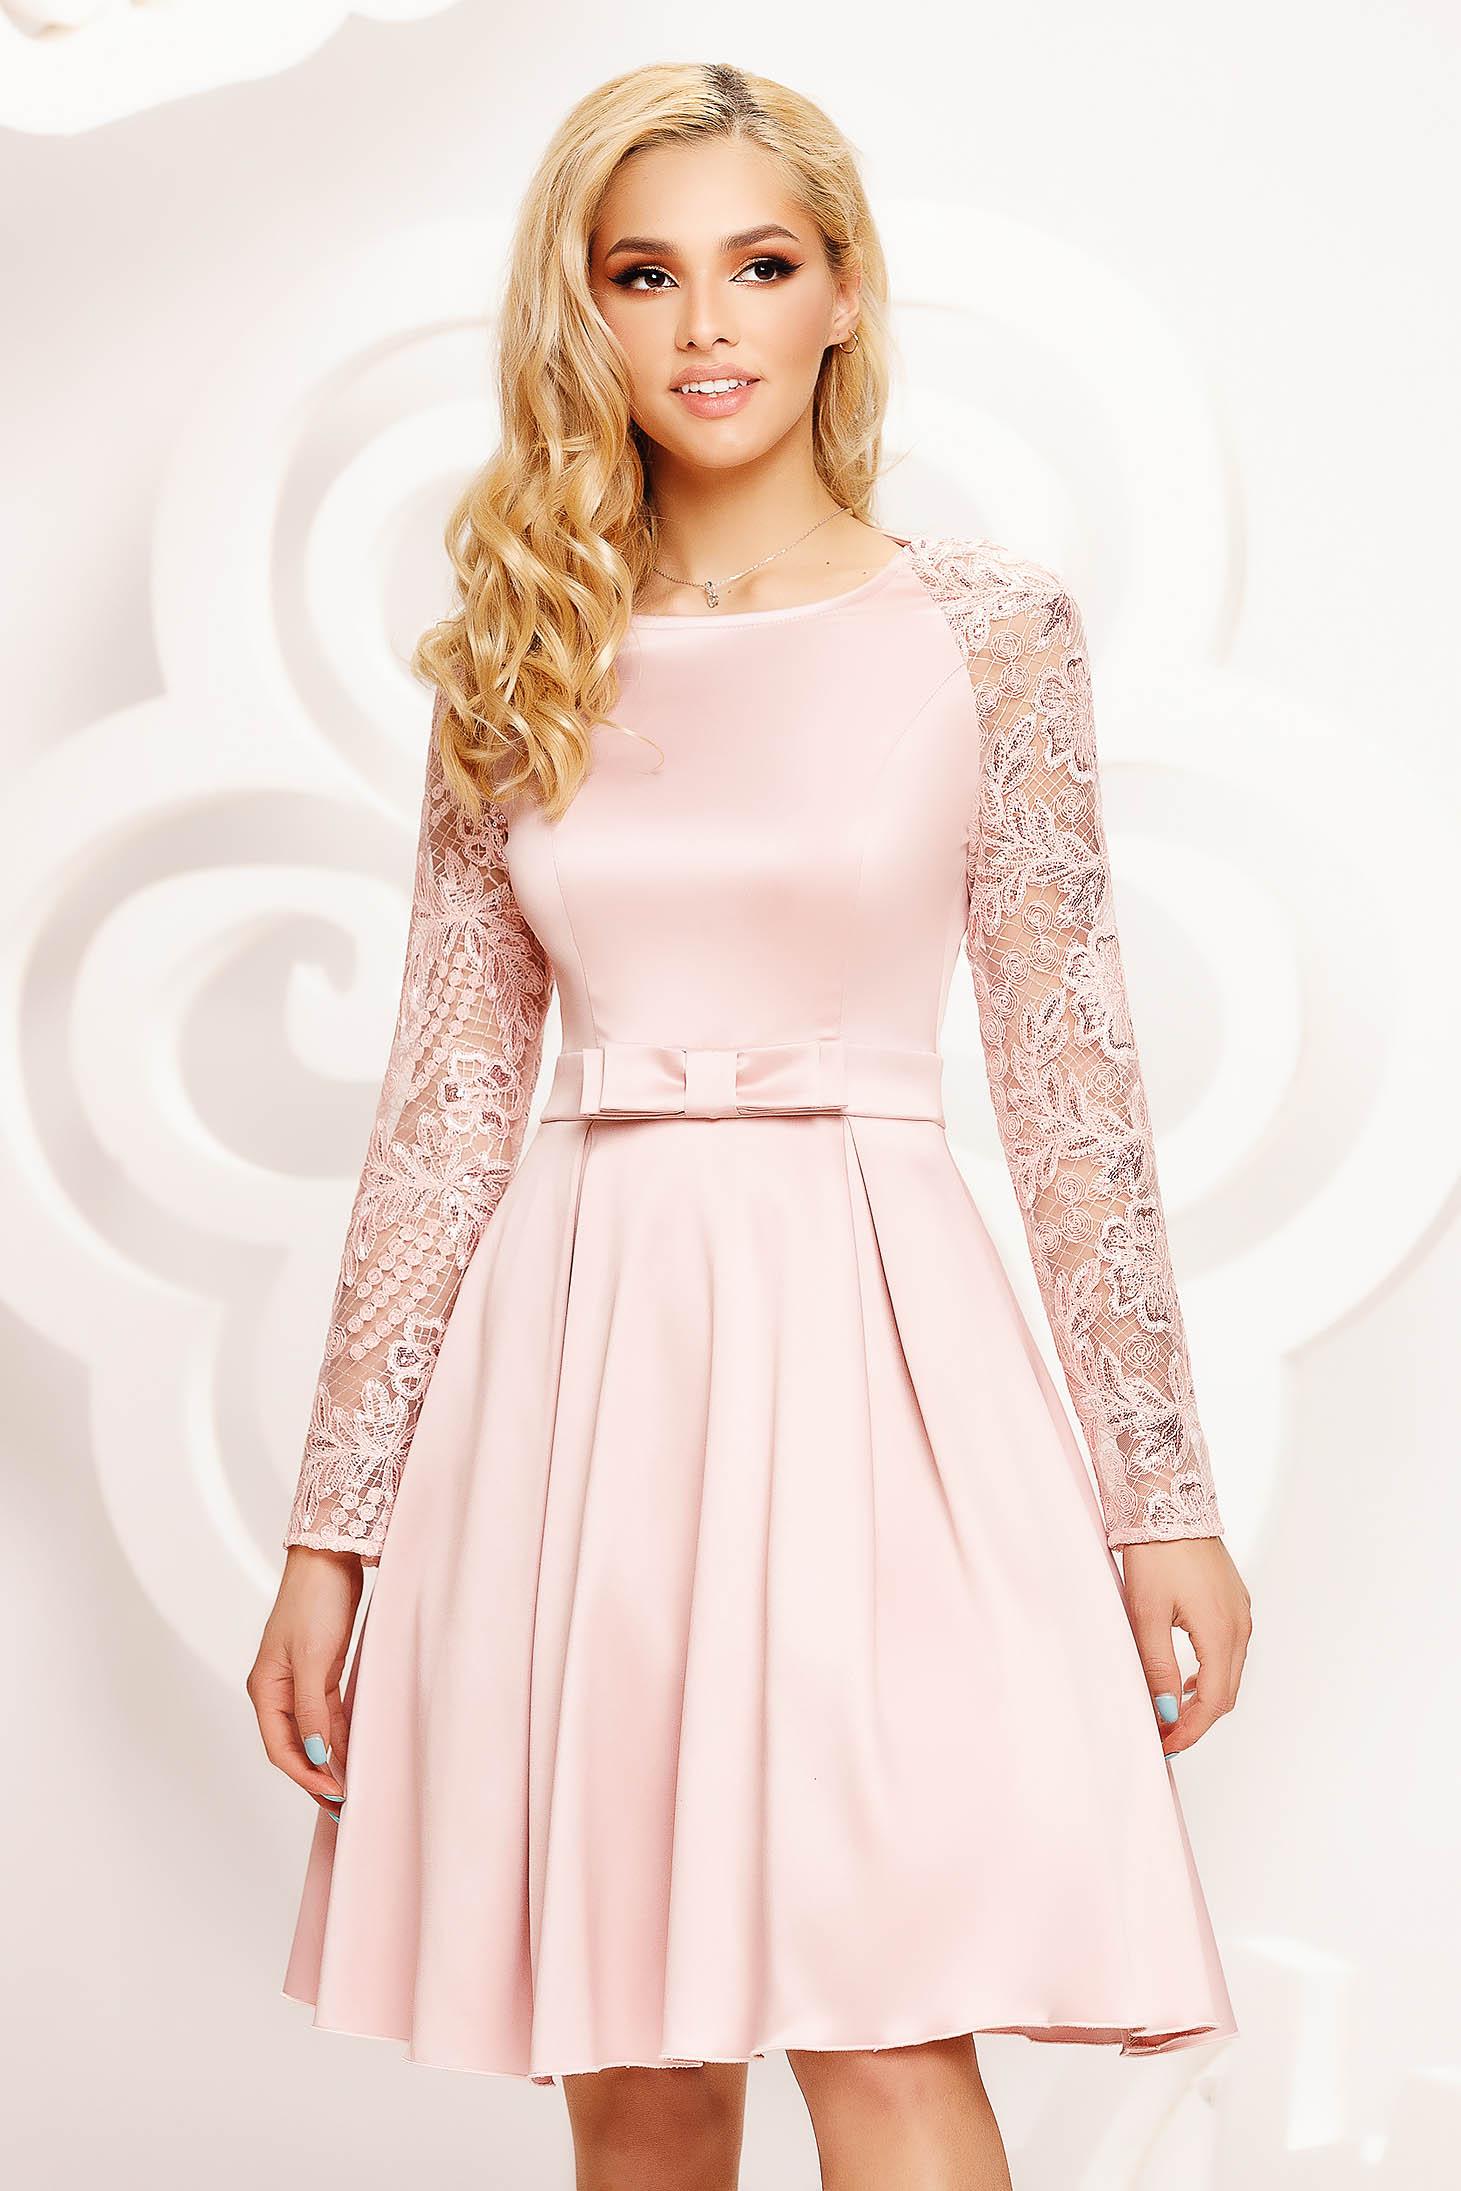 Artista rochie roz prafuit scurta in clos de ocazie maneci transparente